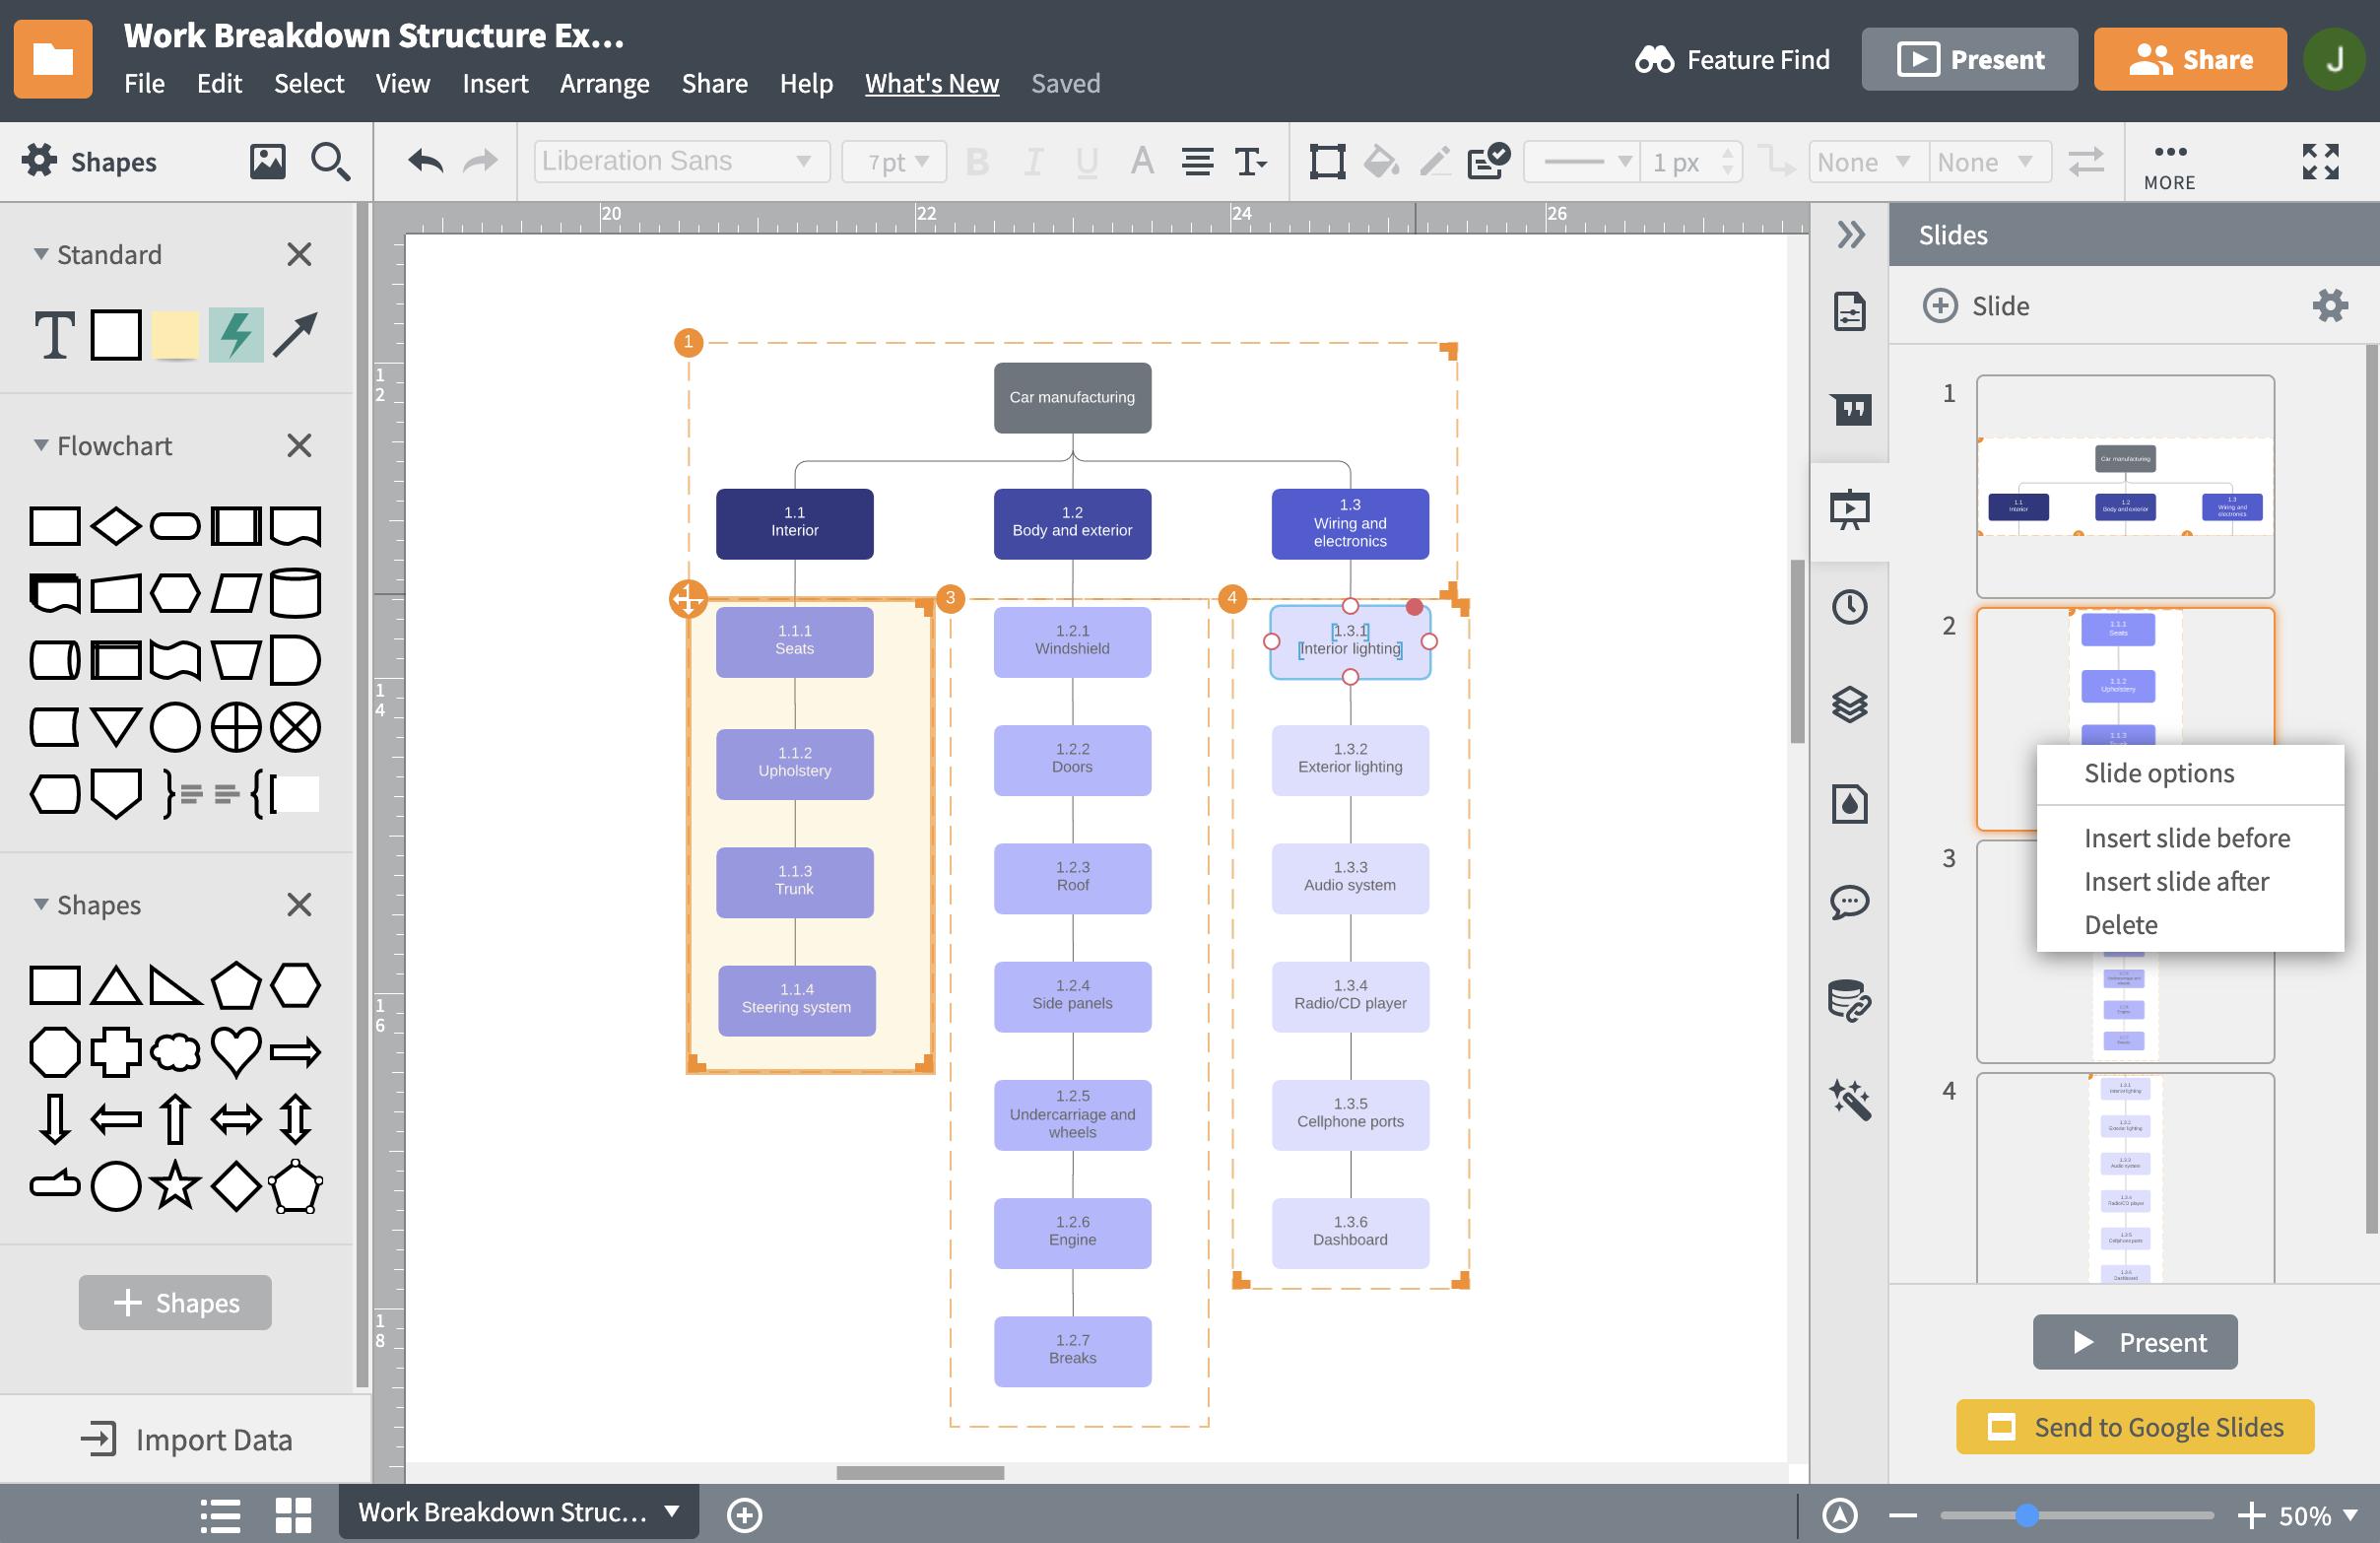 WBS online (Work Breakdown Structure)